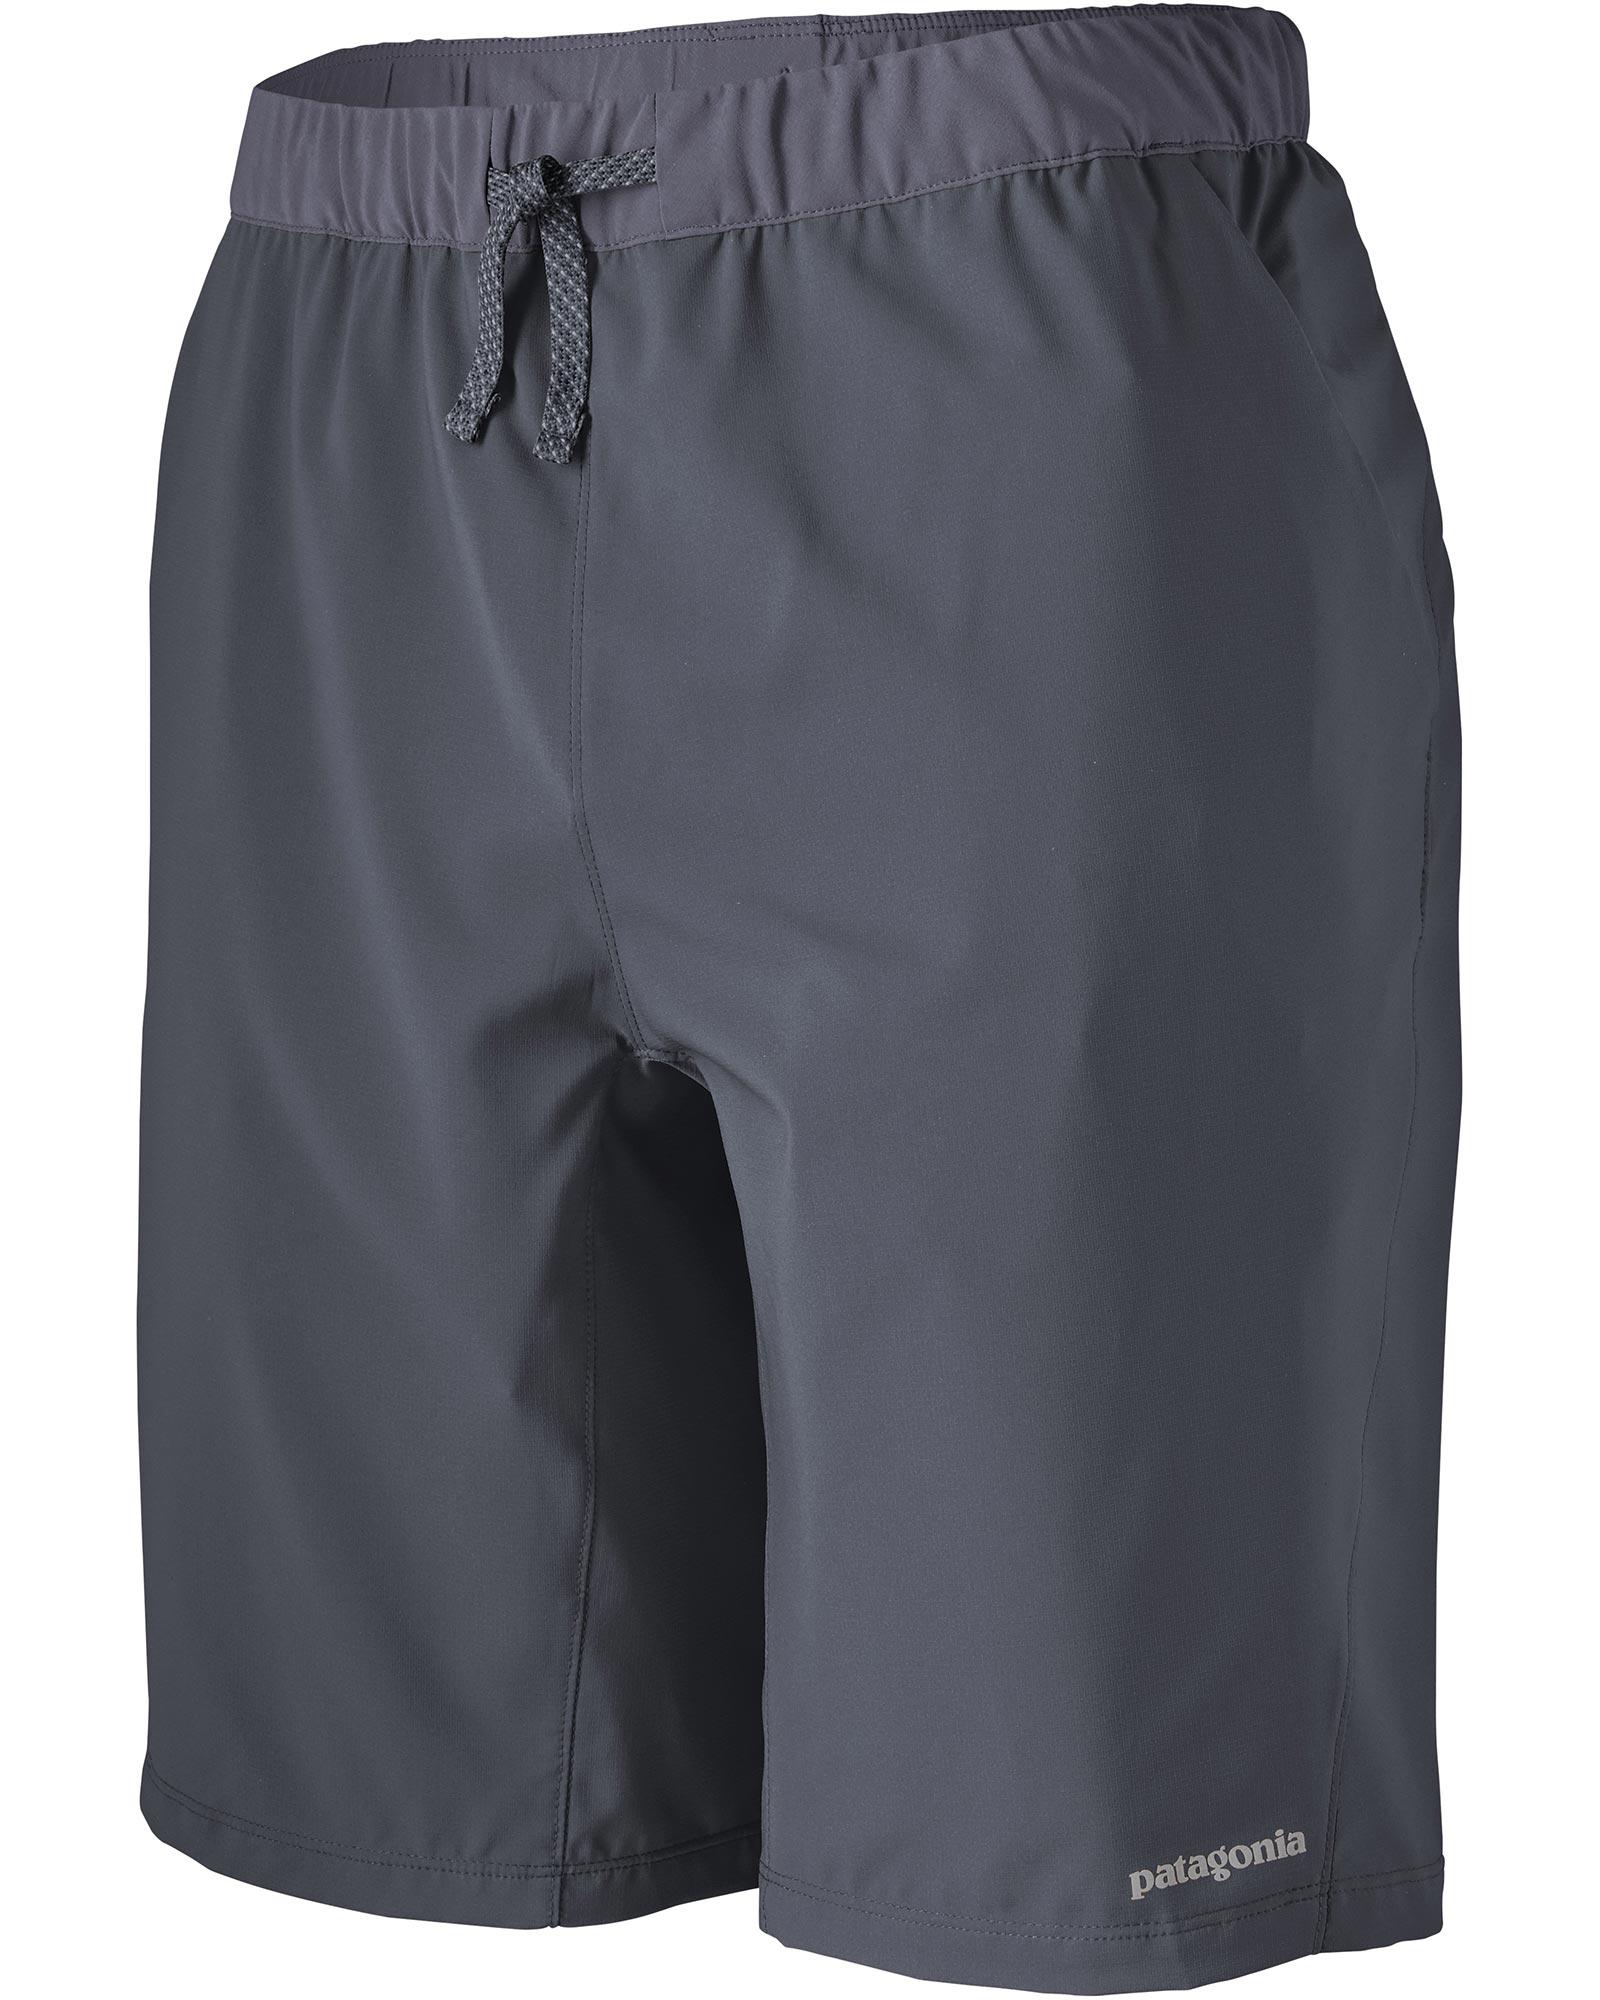 Patagonia Men's Terrebonne Shorts 0